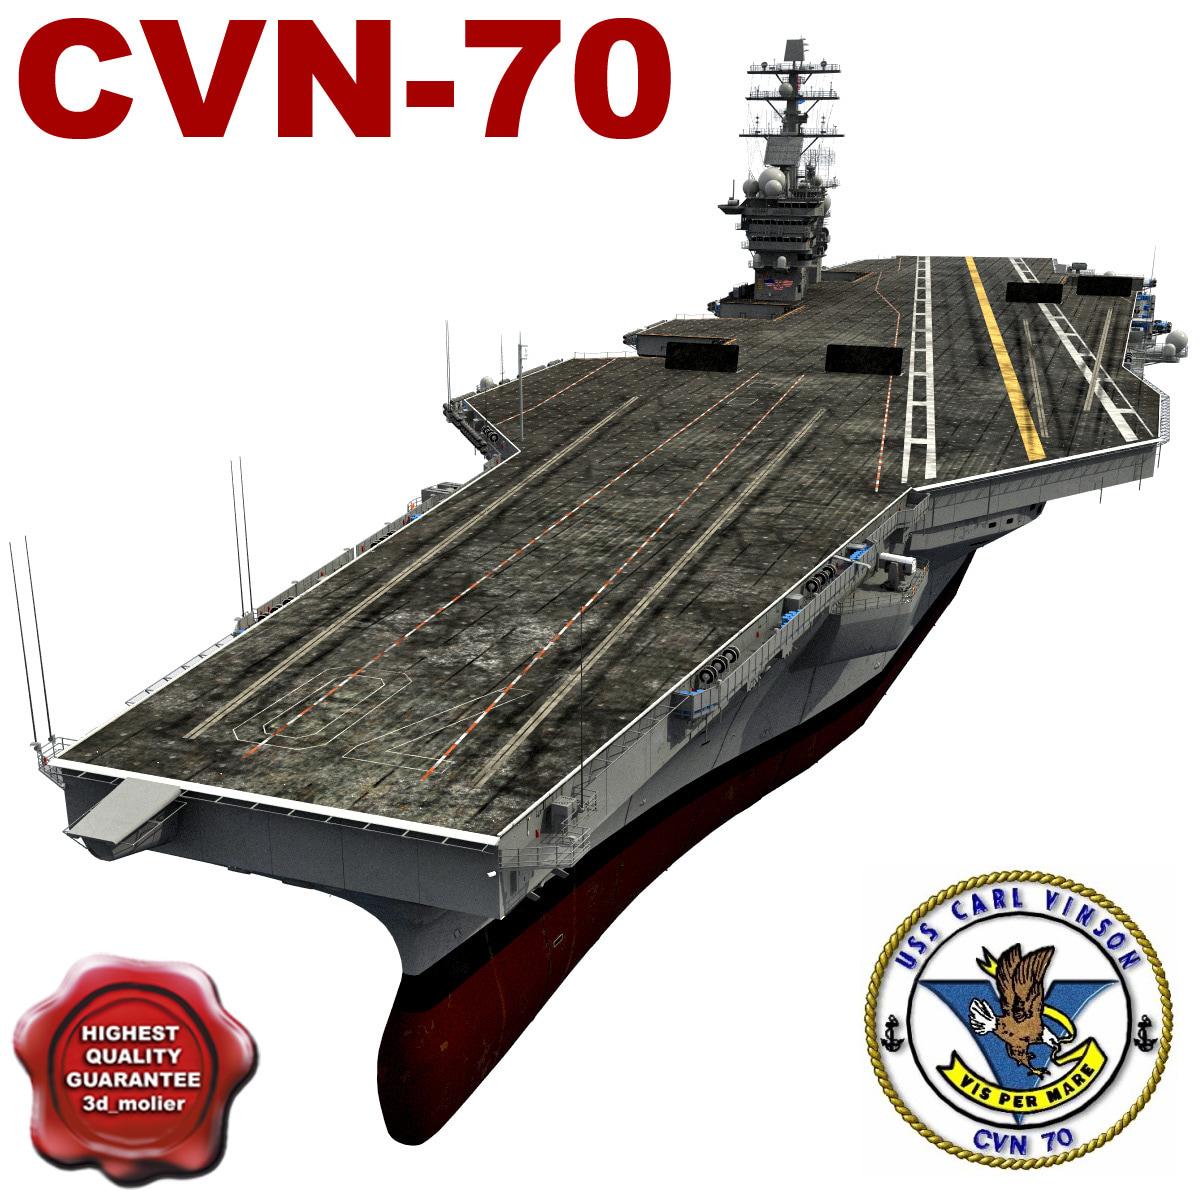 USS_Carl_Vinson_CVN-70_00.jpg